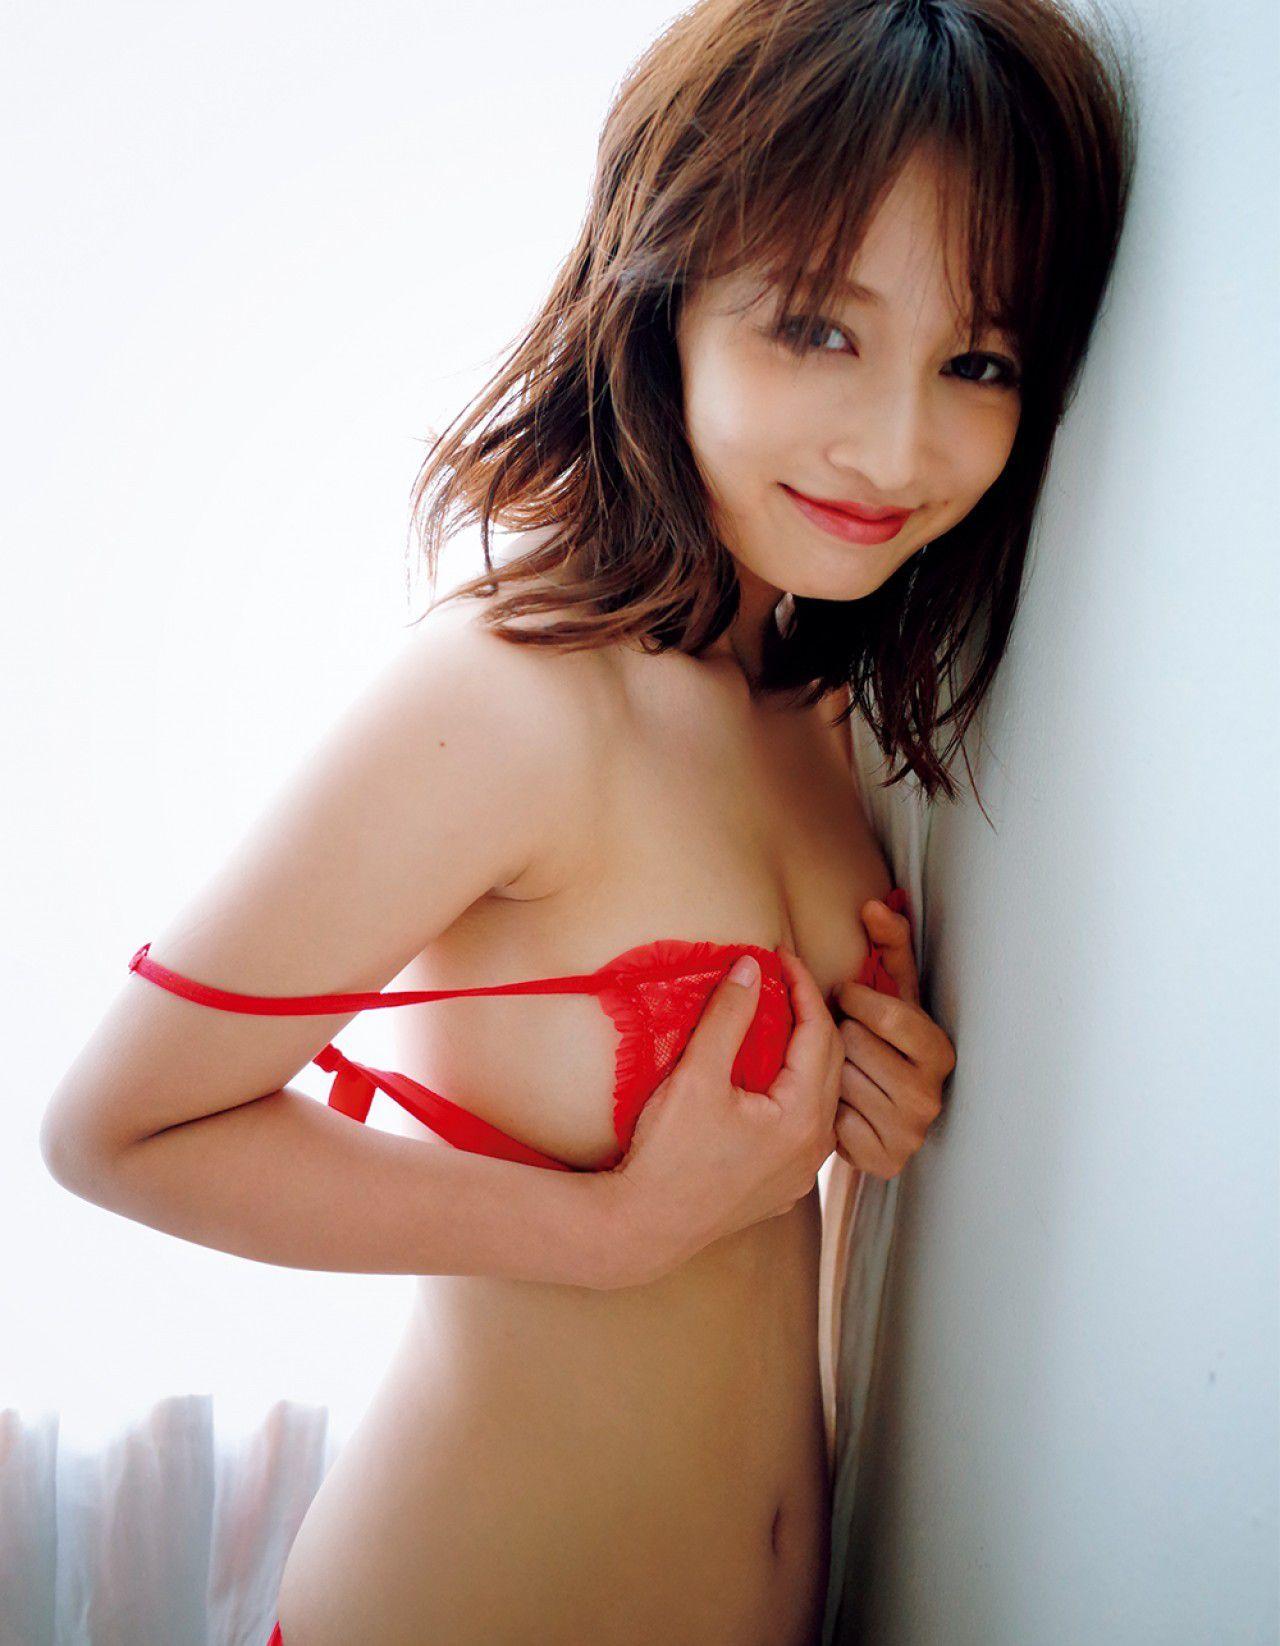 VOL.546 [FRIDAY]日本嫩模:わたなべ麻衣超高清写真套图(6P)